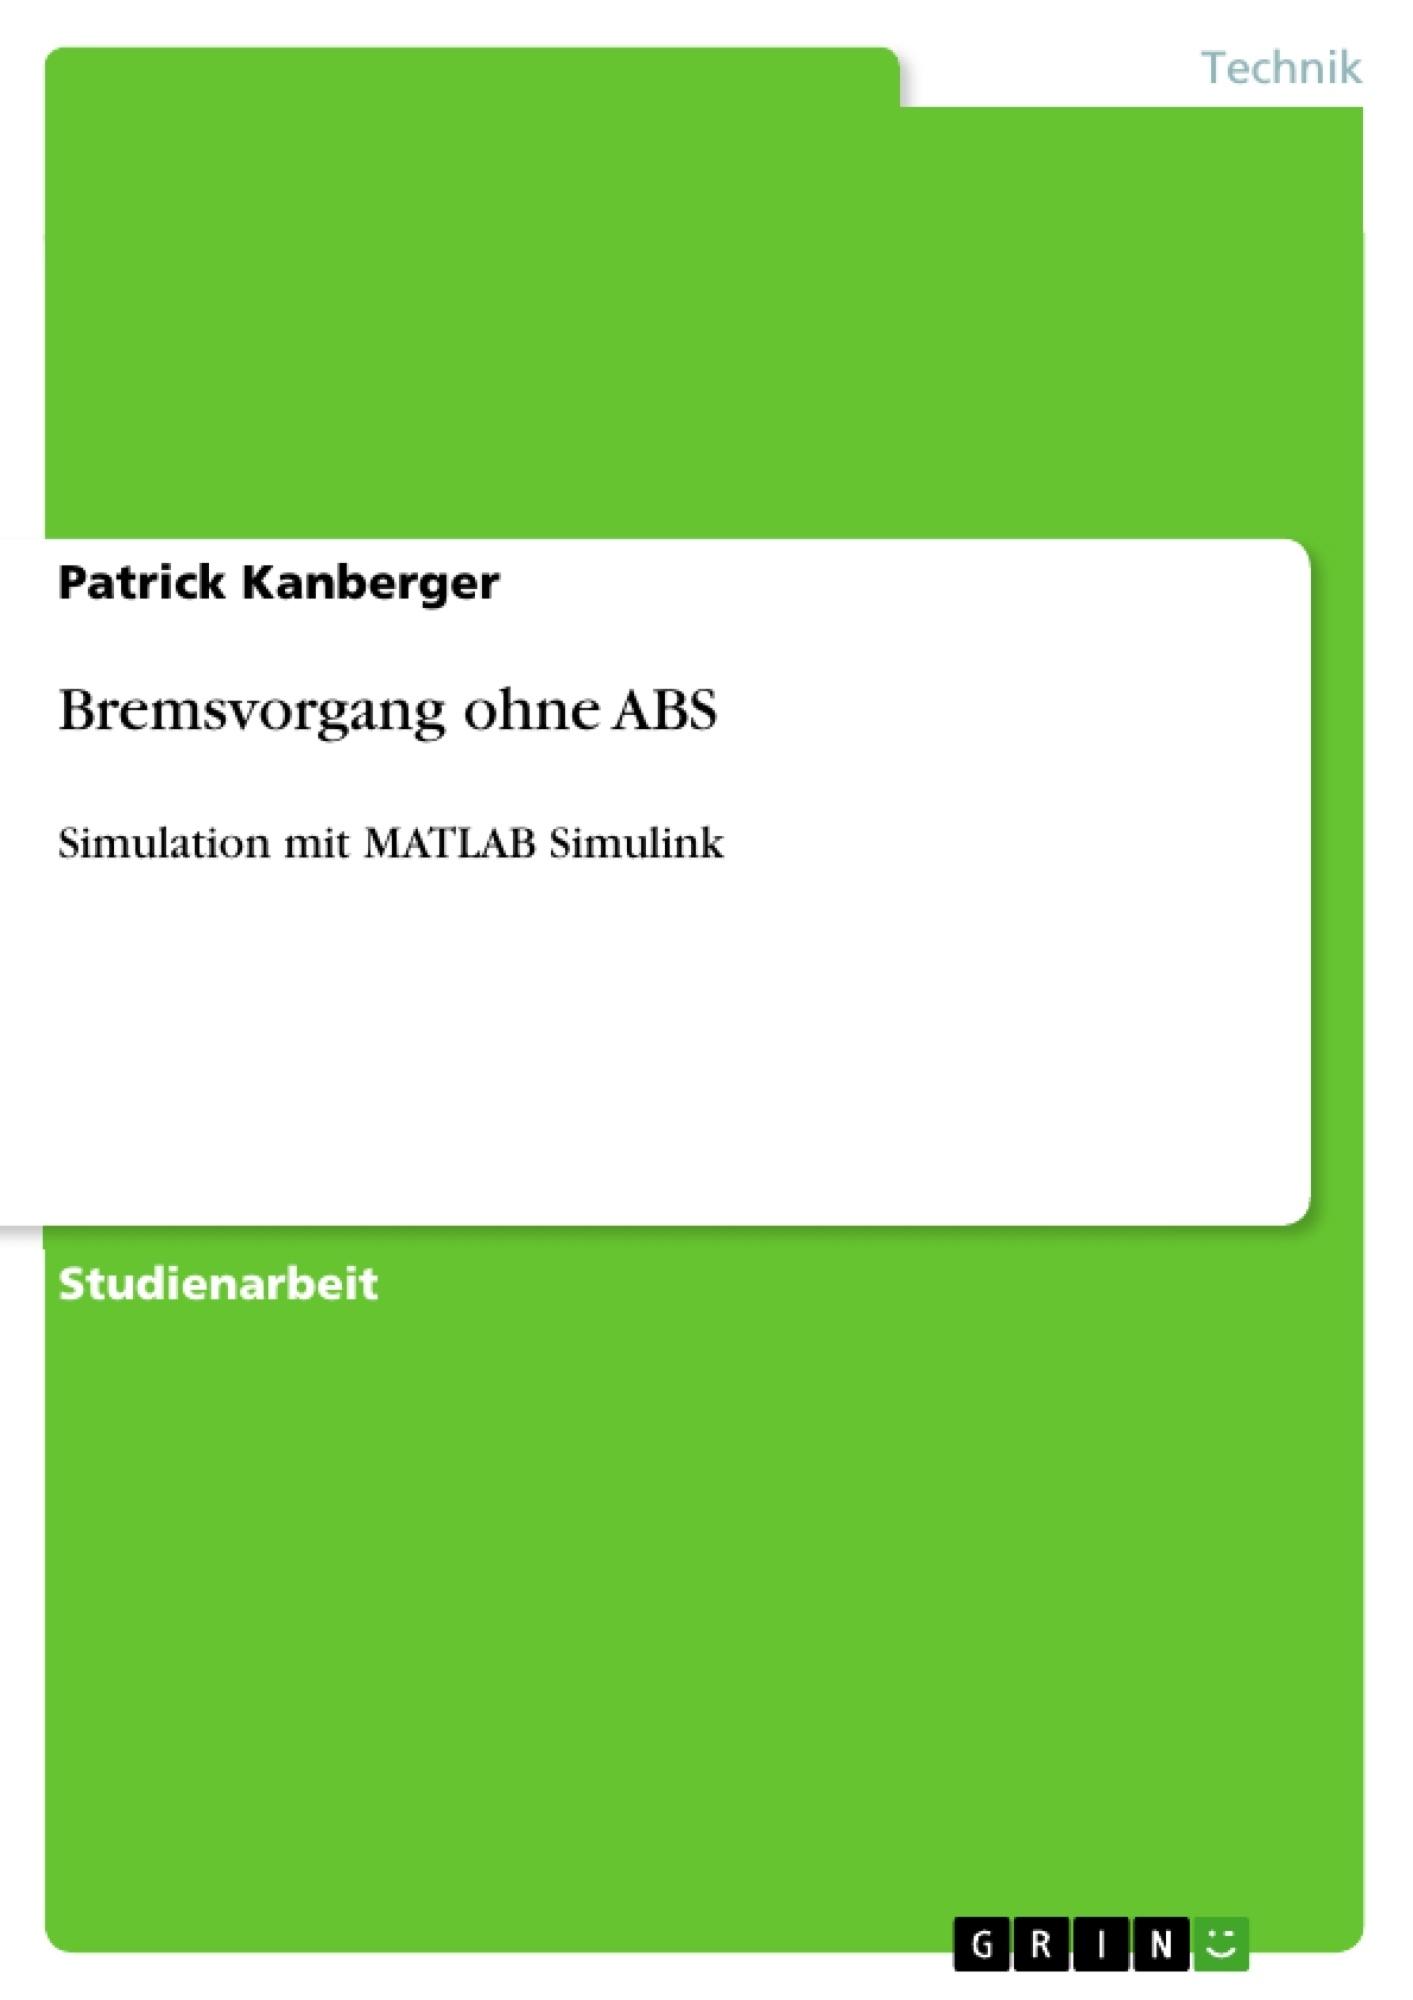 Titel: Bremsvorgang ohne ABS